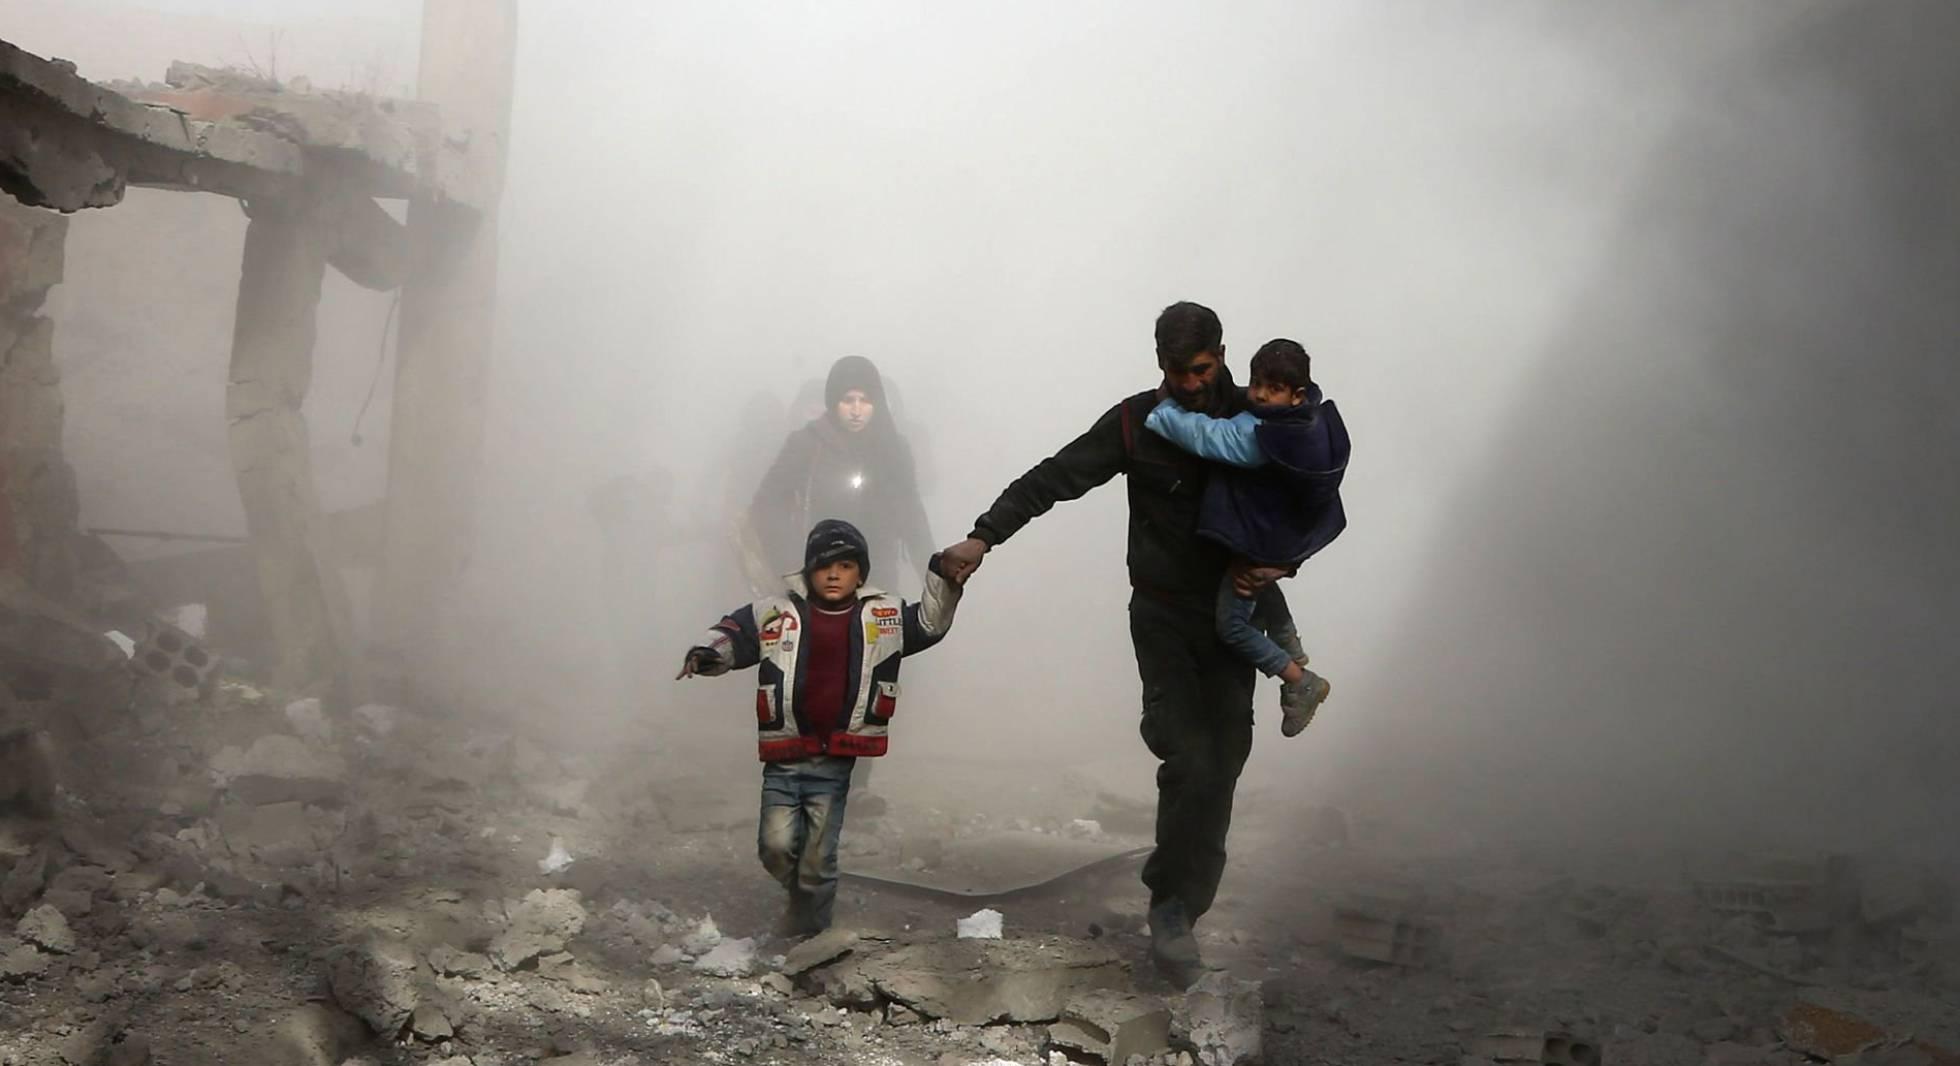 civiles sirios huyendo